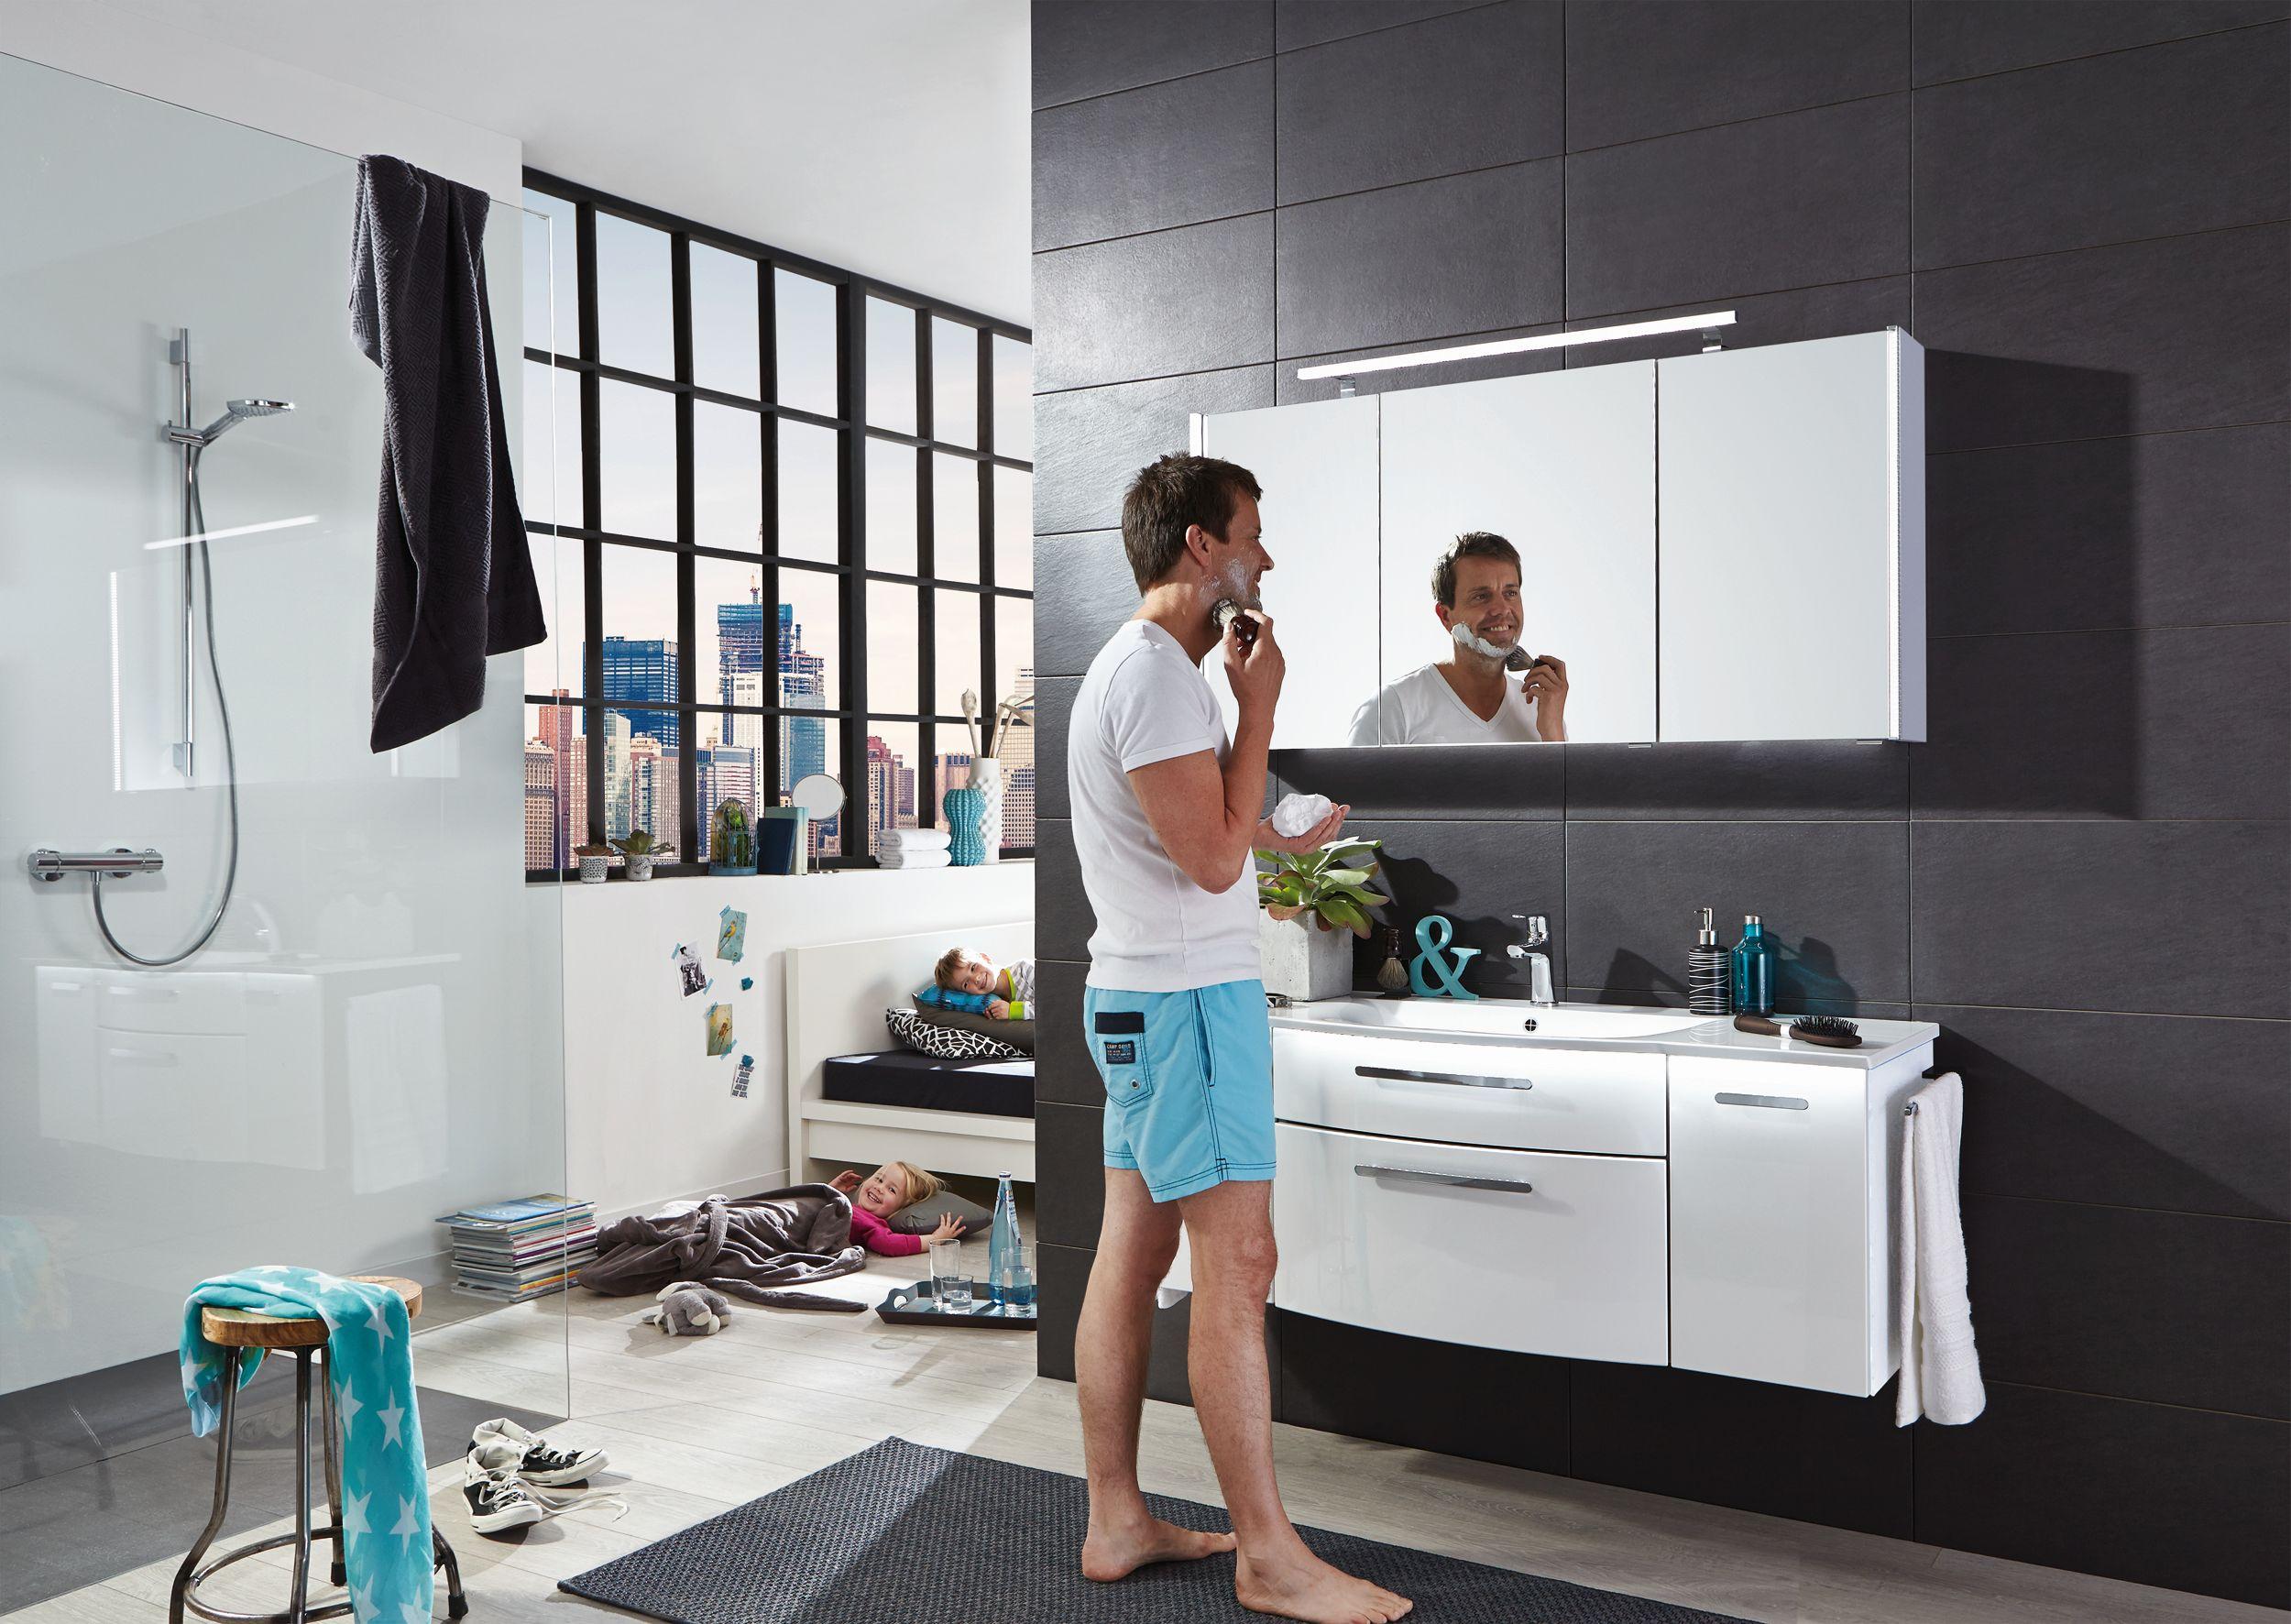 puris linea bad spiegelschrank 130 cm breit s2a431379 badm bel 1